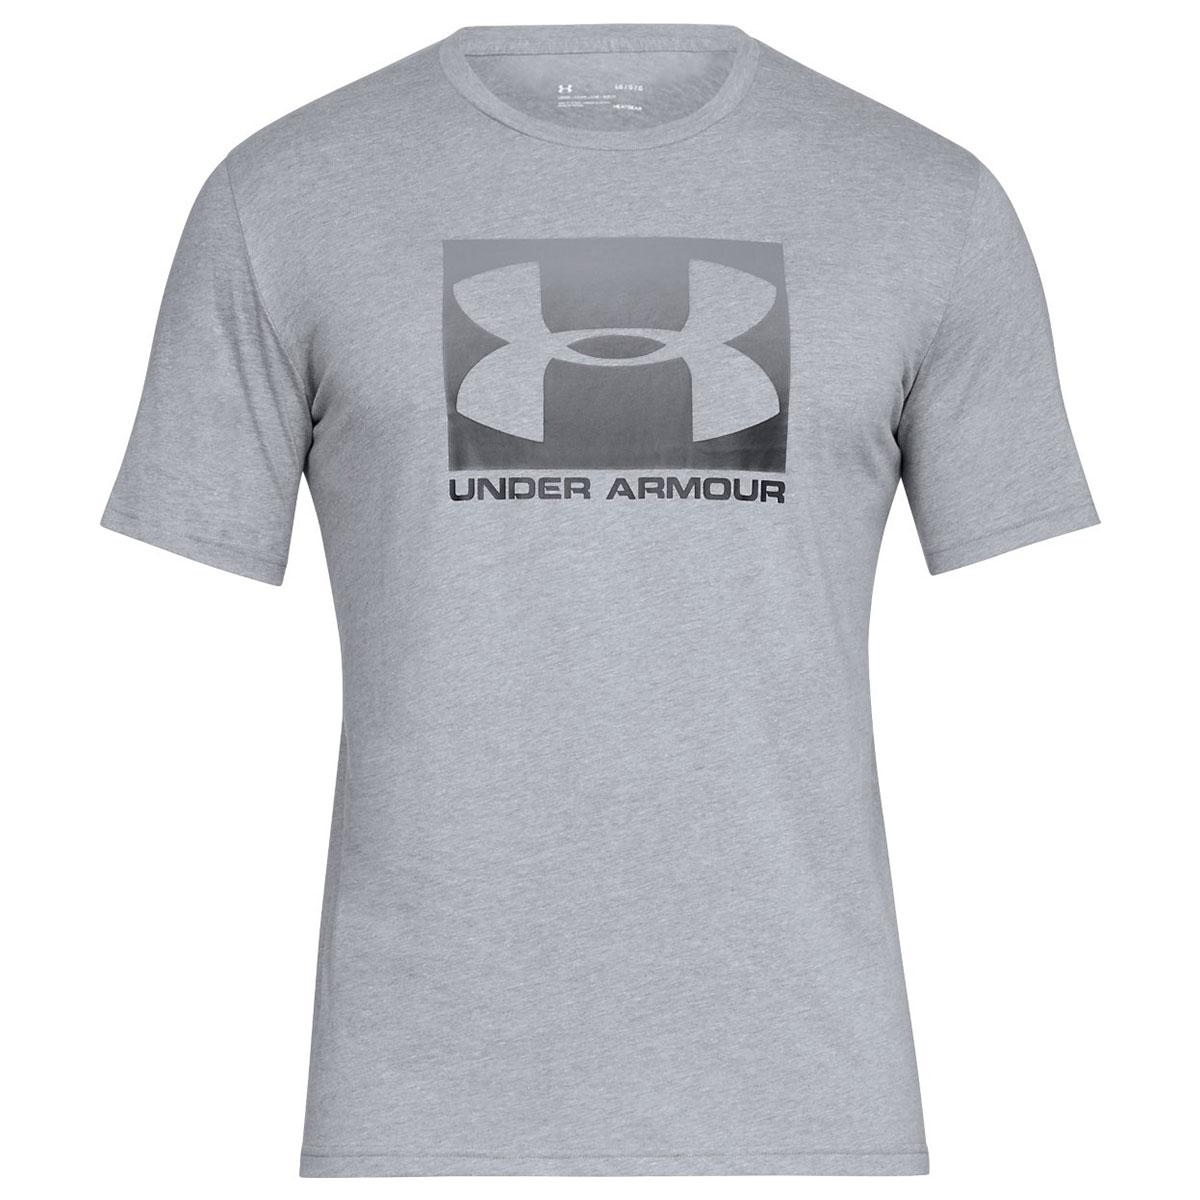 Under-Armour-Mens-2019-UA-Boxed-Sportstyle-HeatGear-Training-Gym-T-Shirt-Tee thumbnail 20